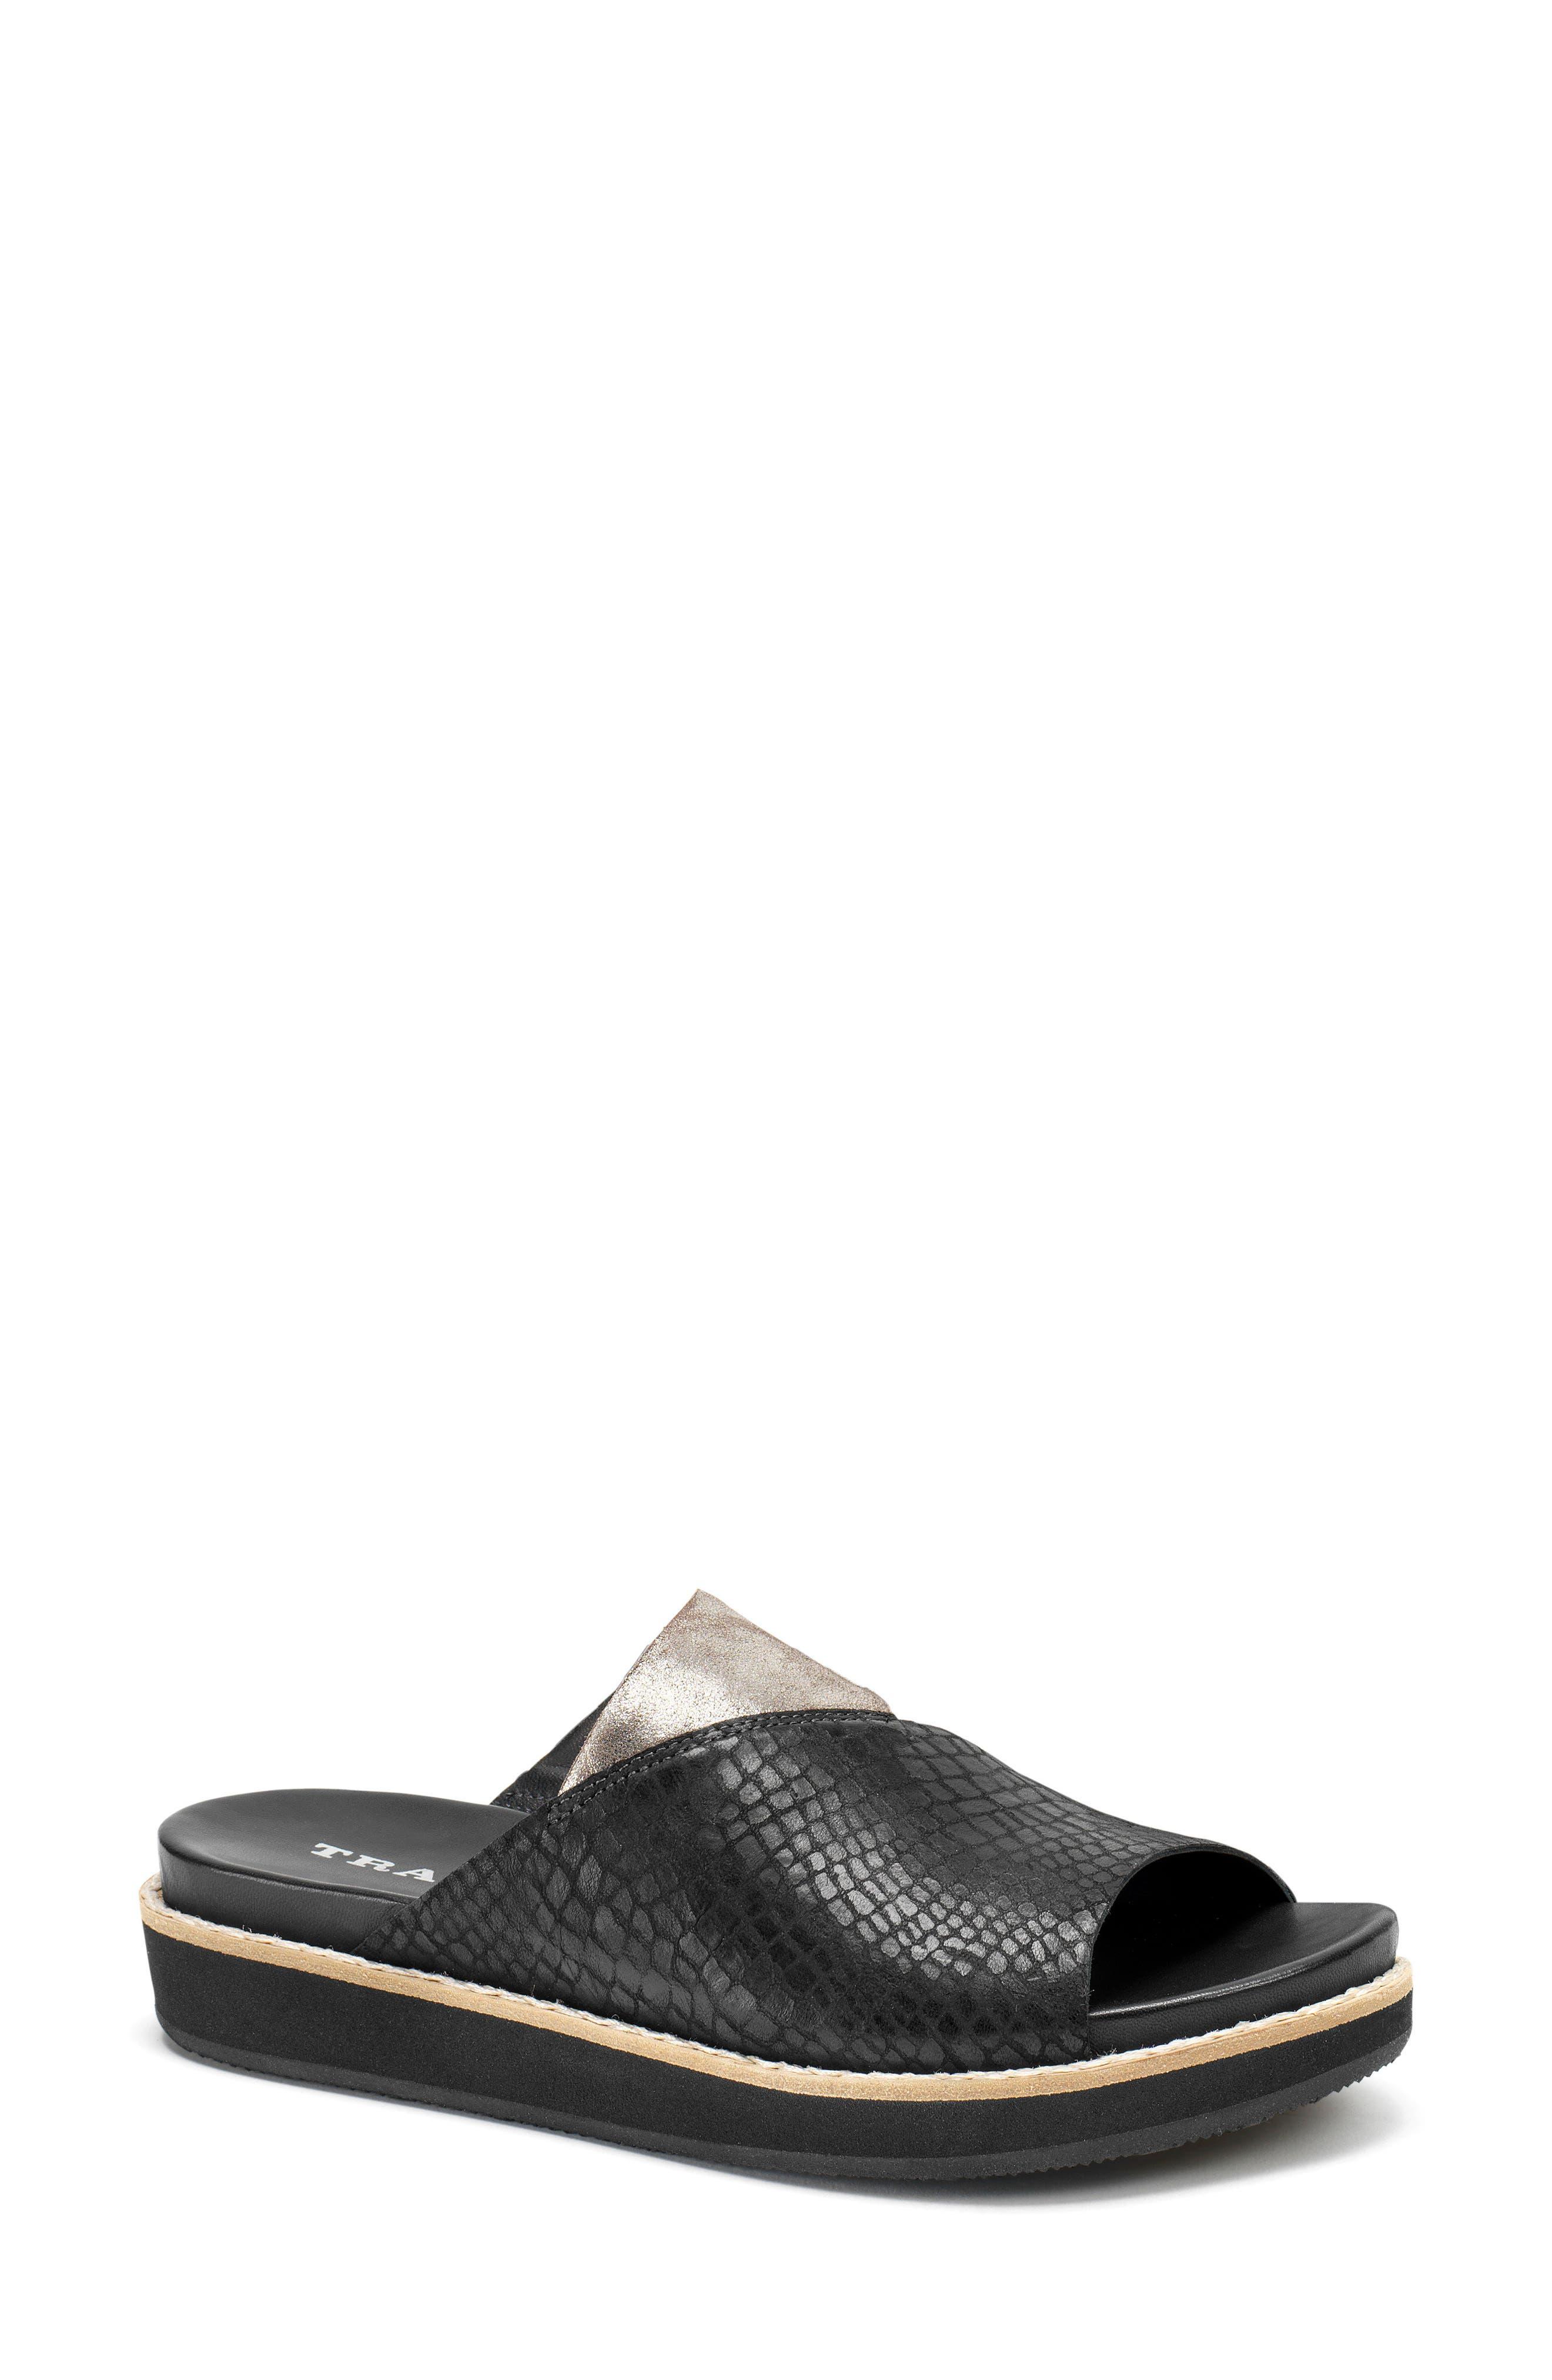 Codi Sandal,                             Main thumbnail 1, color,                             Black Embossed Leather